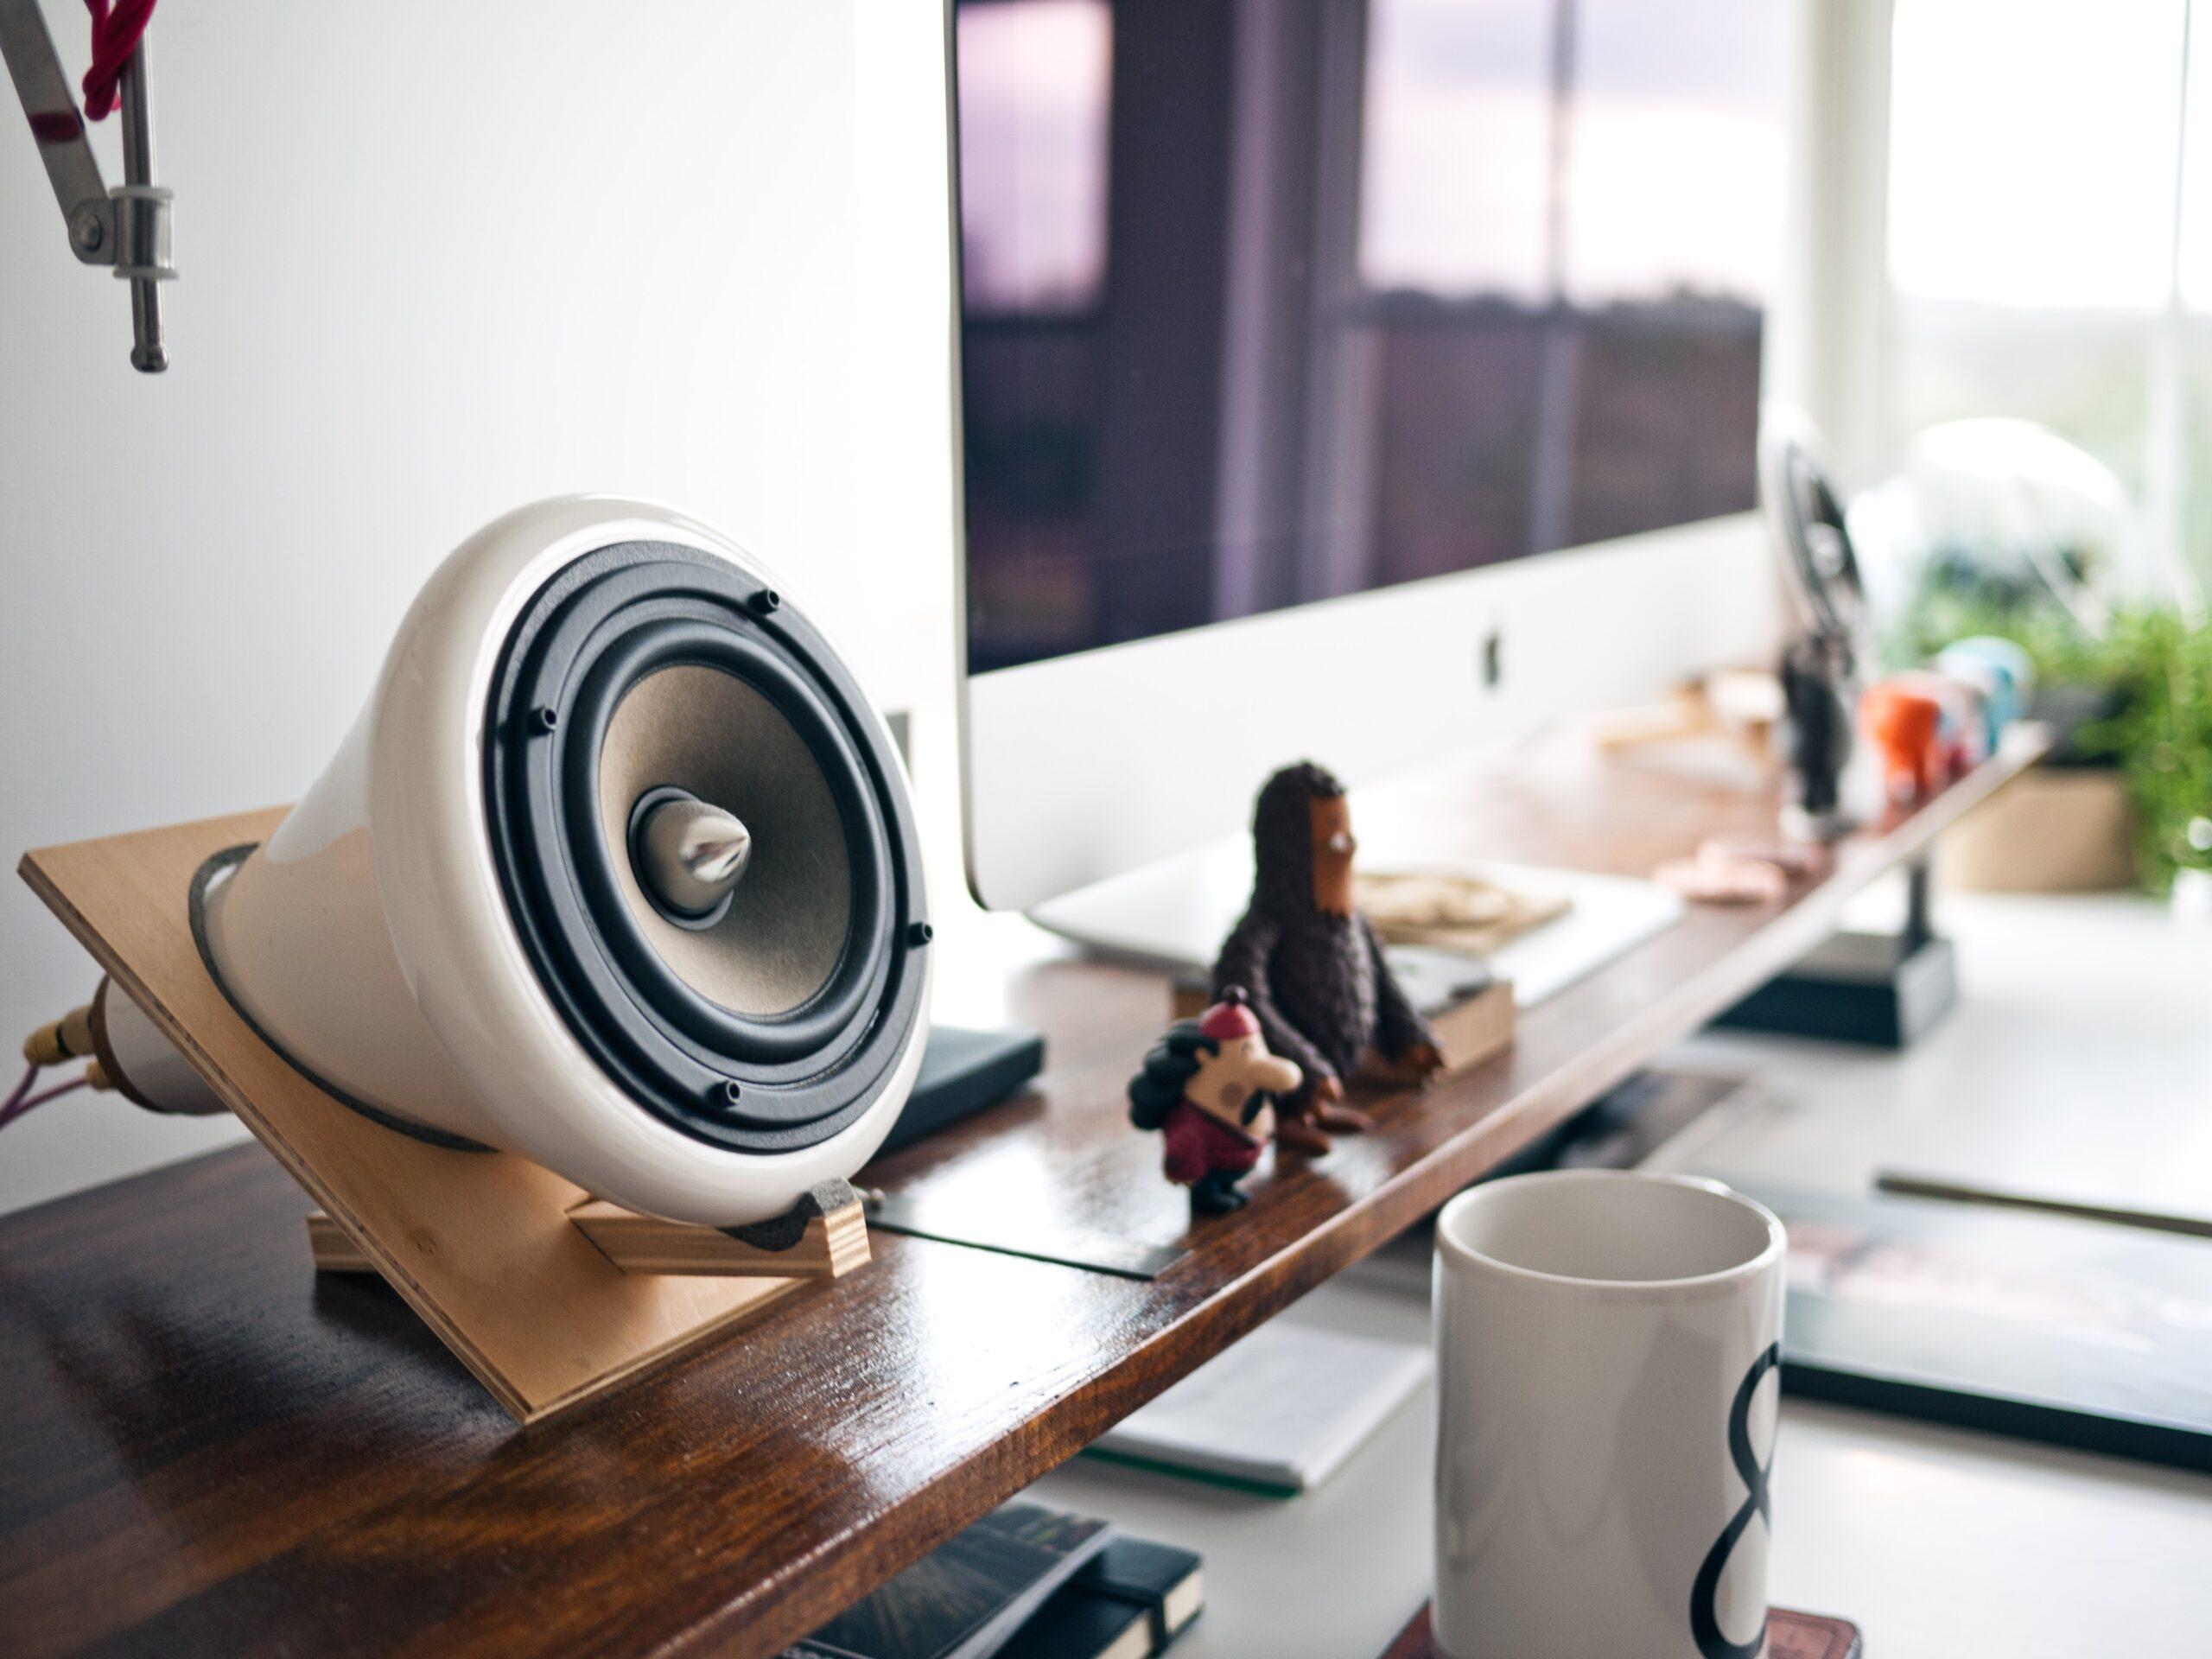 straighten up your desk